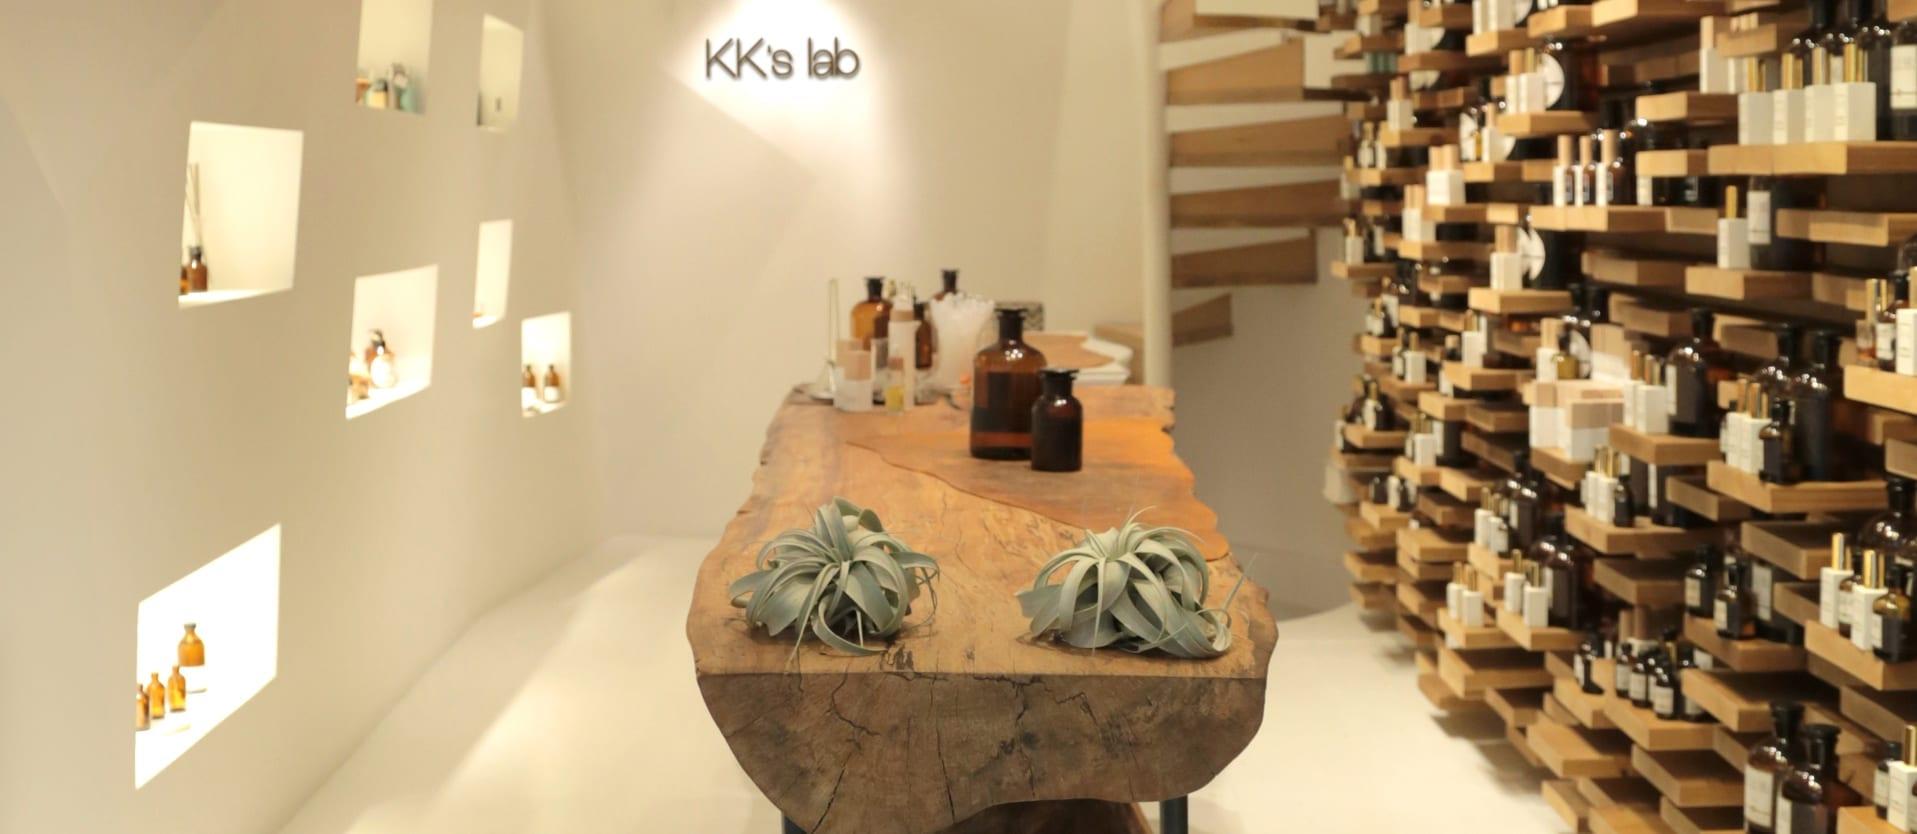 KK's Lab